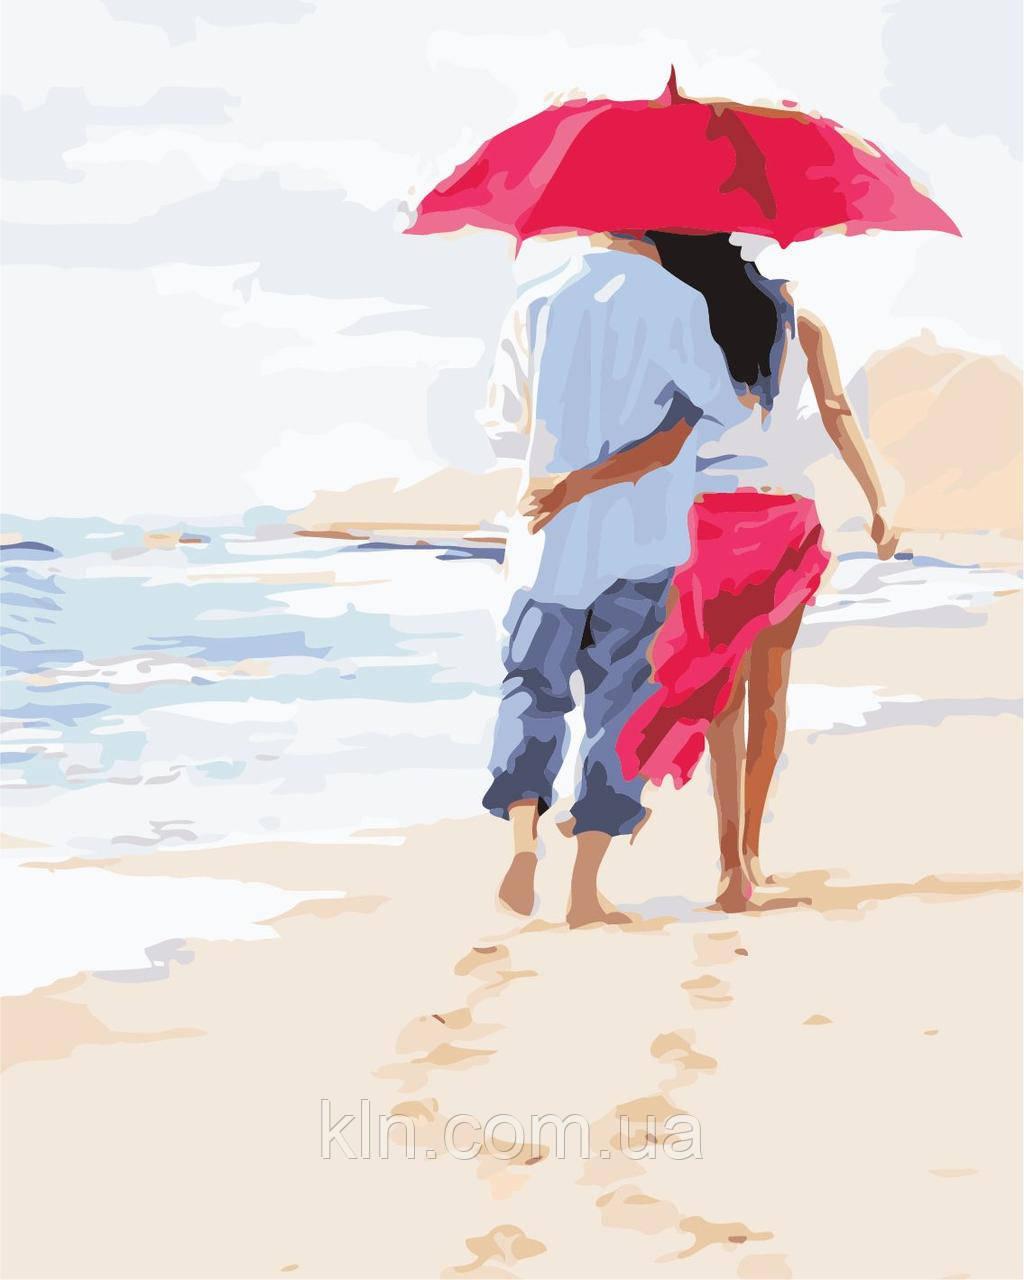 Картина по номерам ArtStory Вместе по жизни 40 х 50 см (арт. AS0430)